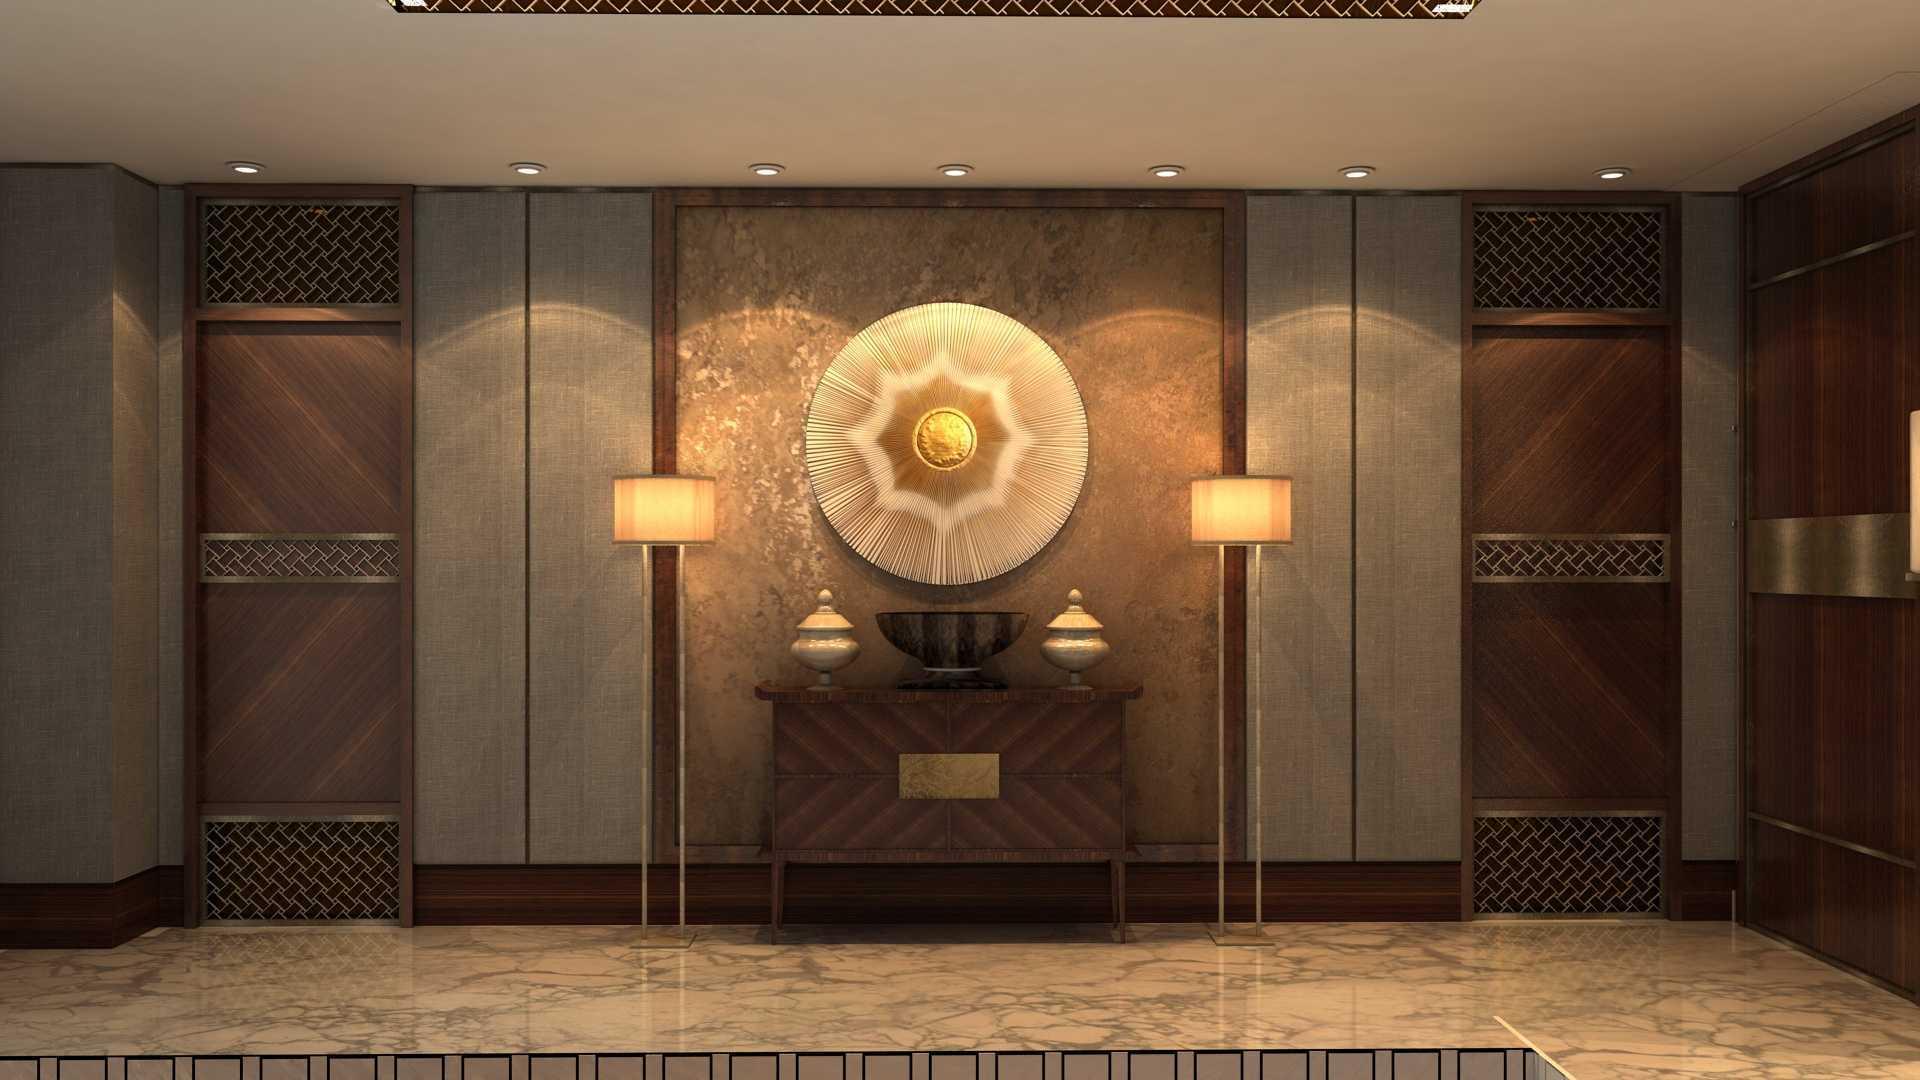 Vin•da•te Mayang Permai Residence Ii - Residential Project (Artist Impression - Construction In Progress) Pantai Indah Kapuk - North Jakarta Pantai Indah Kapuk - North Jakarta Lt Kontemporer  17216